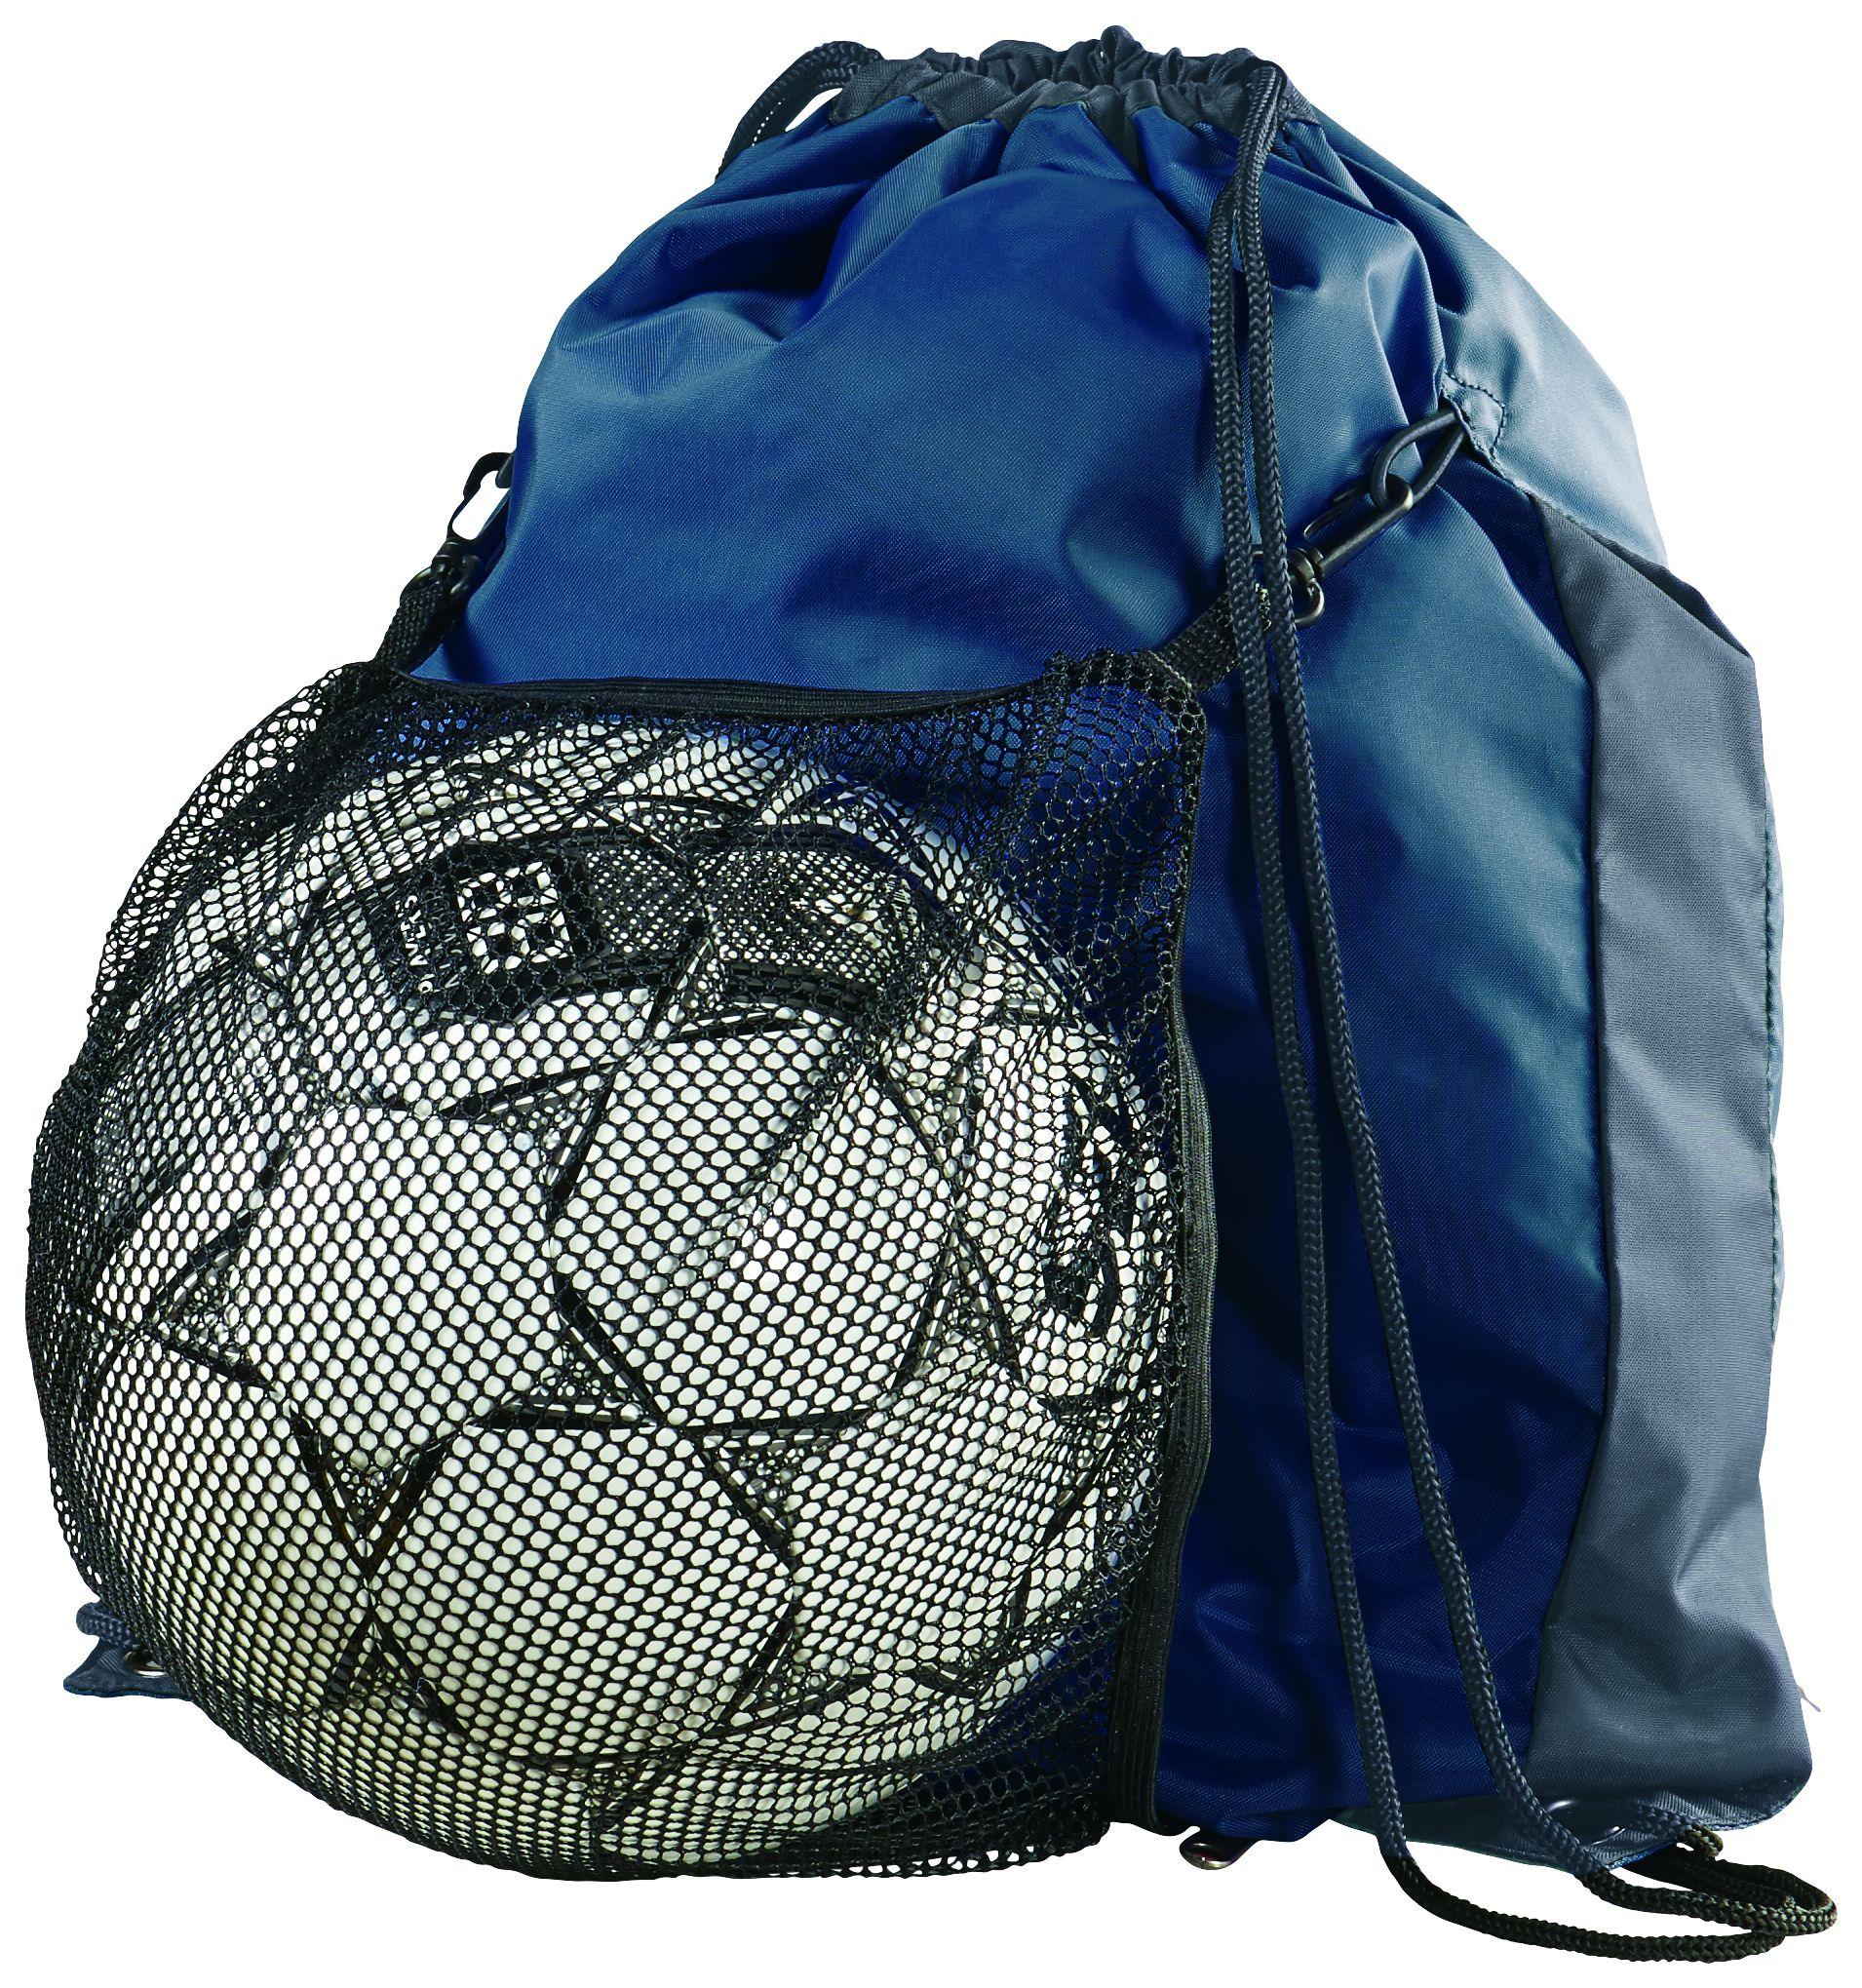 Convertible Drawstring Backpack - NAVY/GRAPHITE